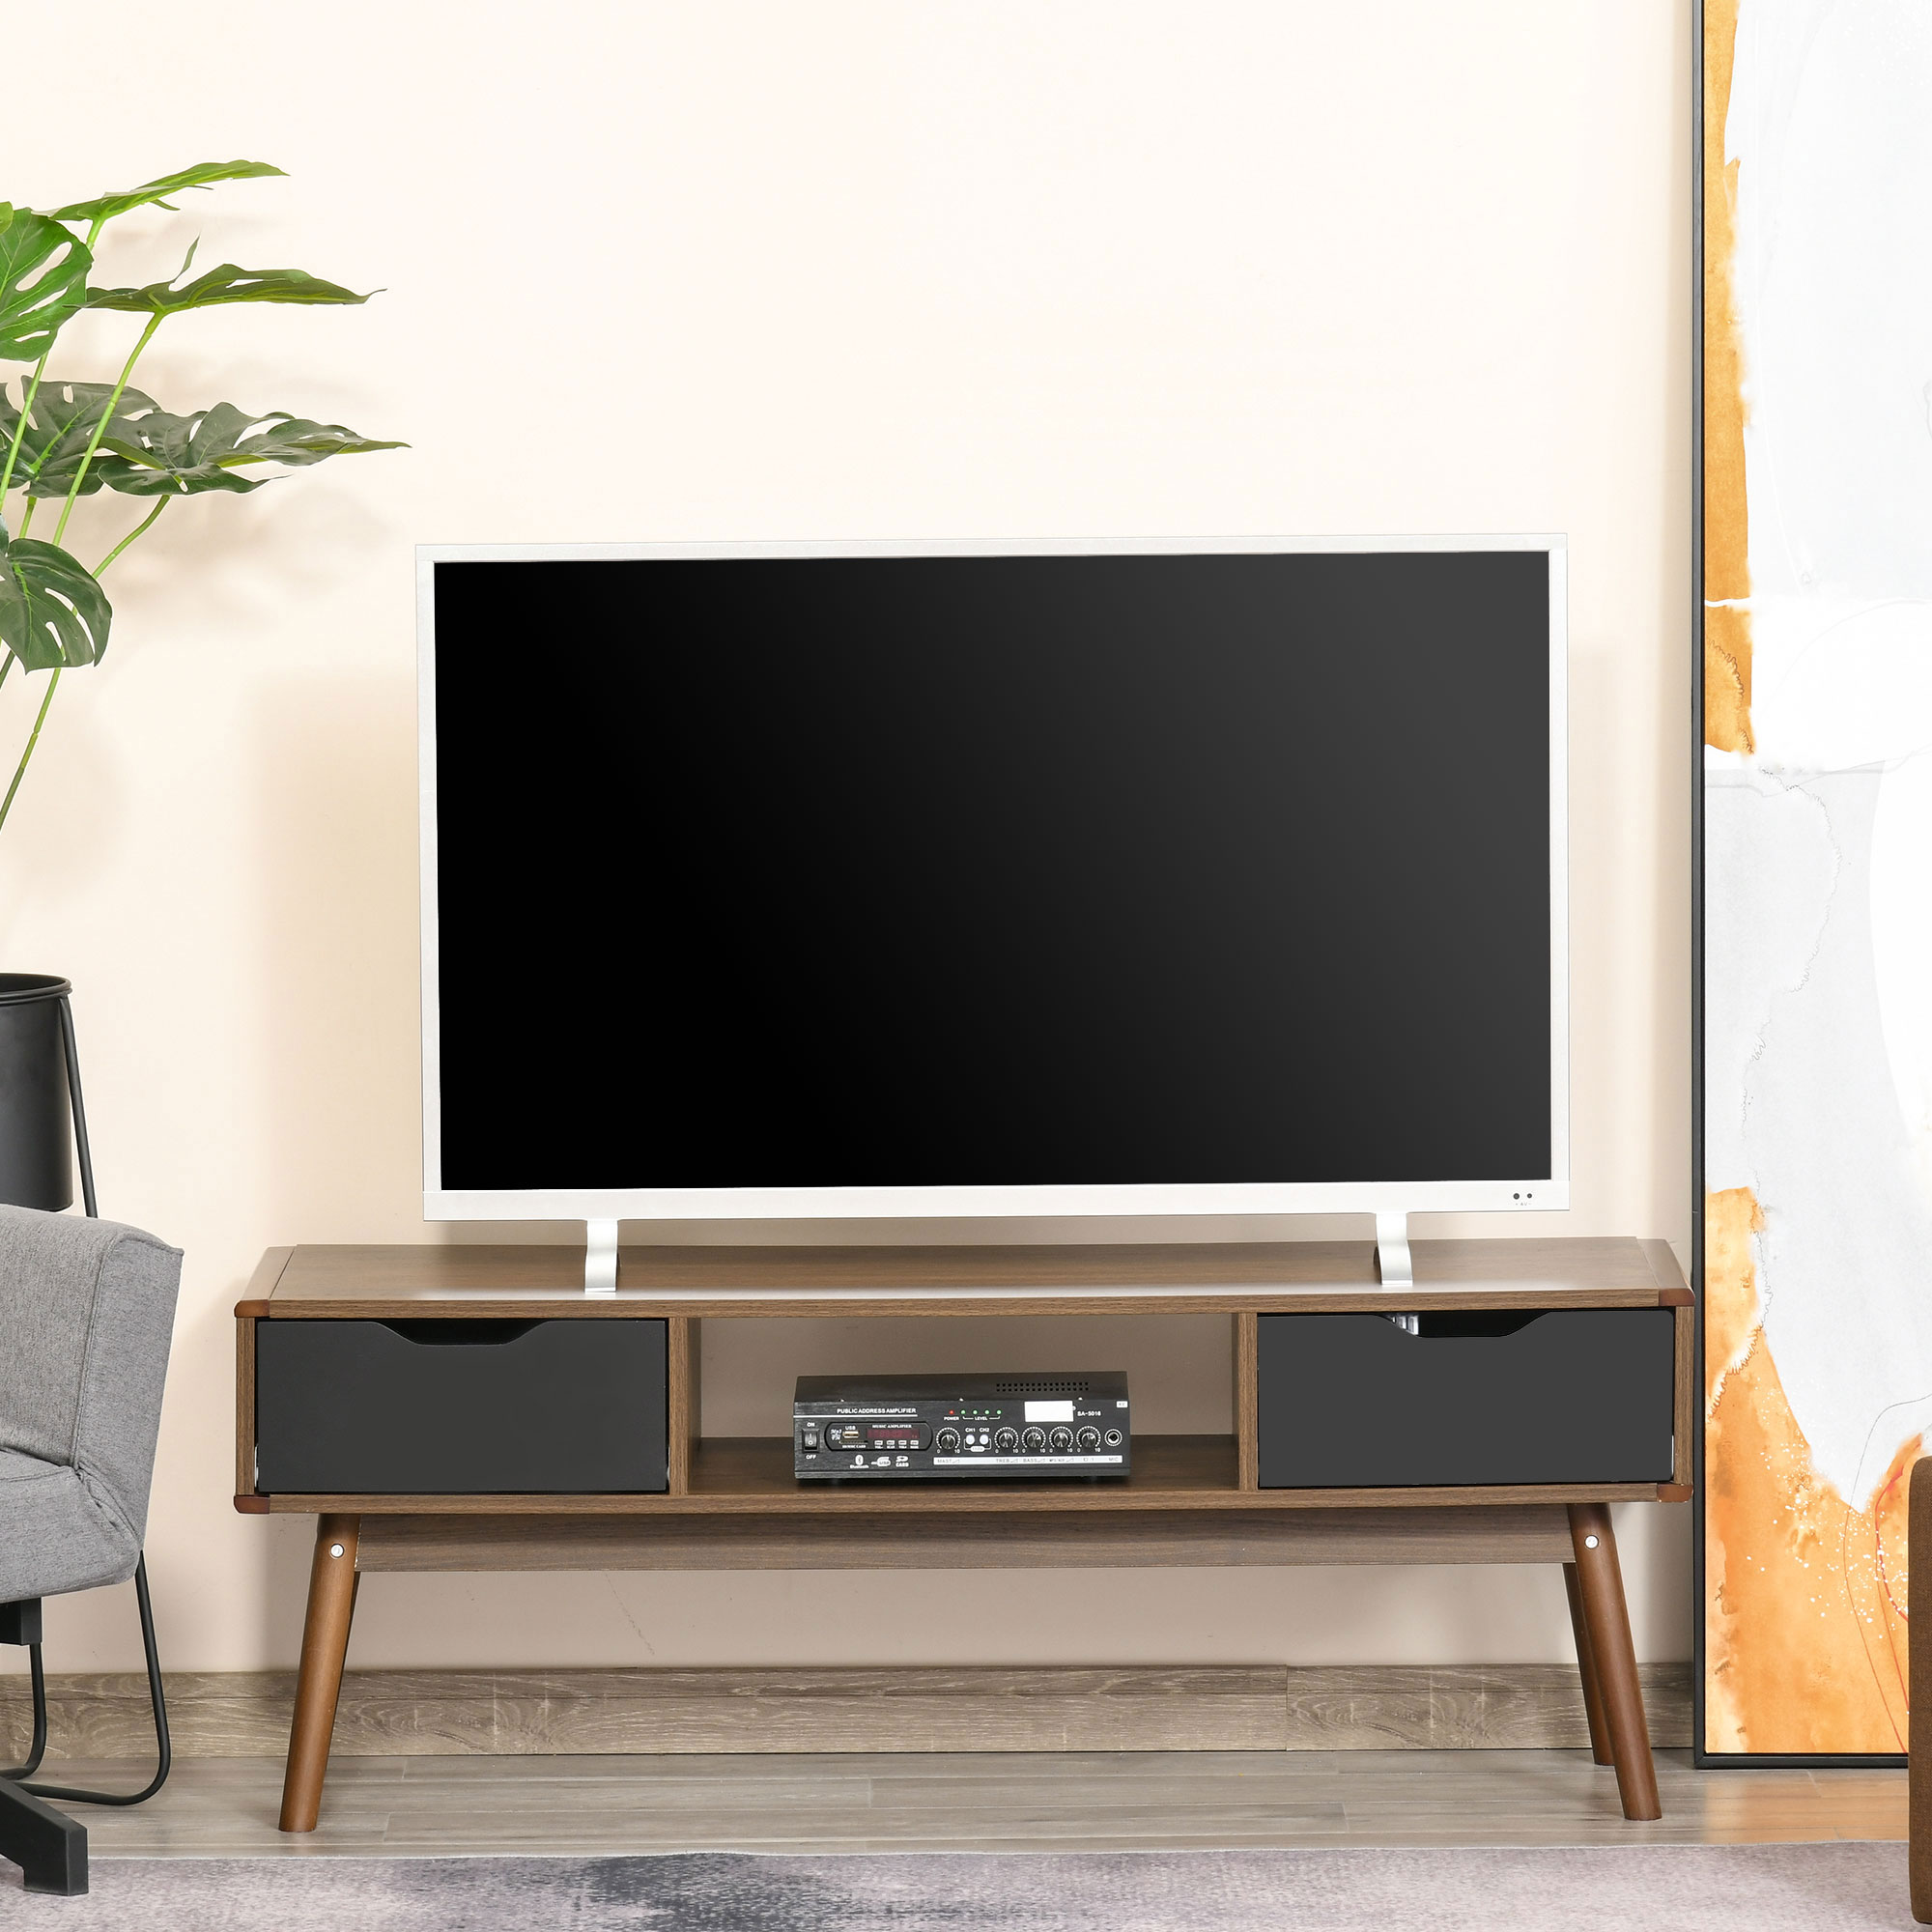 Meuble TV bas sur pieds style scandinave 2 tiroirs aspect noyer